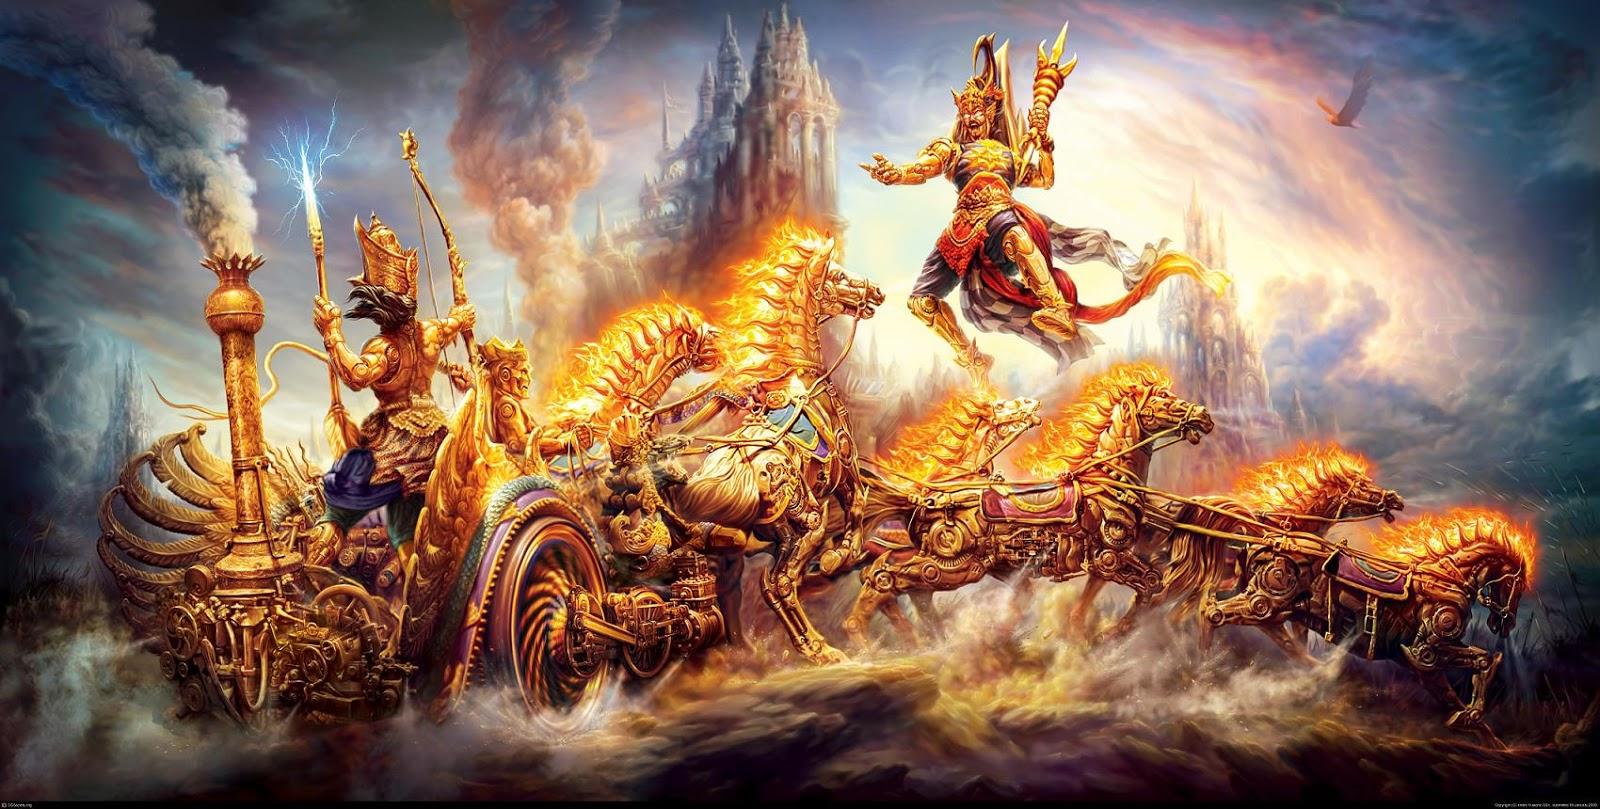 war of mahabharata karana and arjuna